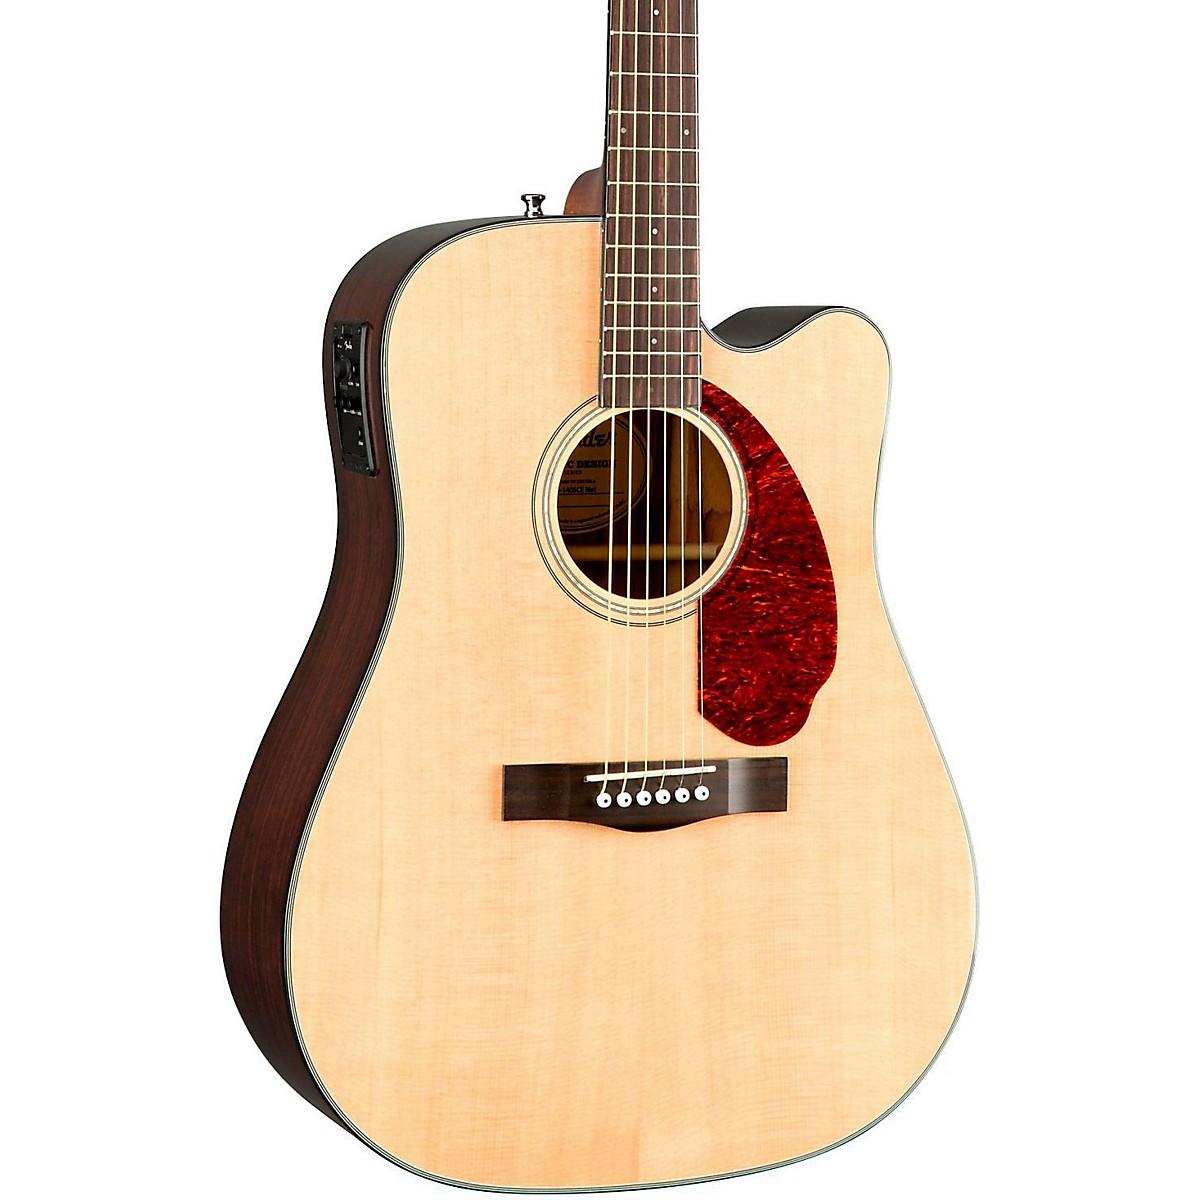 Fender Classic Design Series CD-140SCE Cutaway Dreadnought Acoustic-Electric Guitar